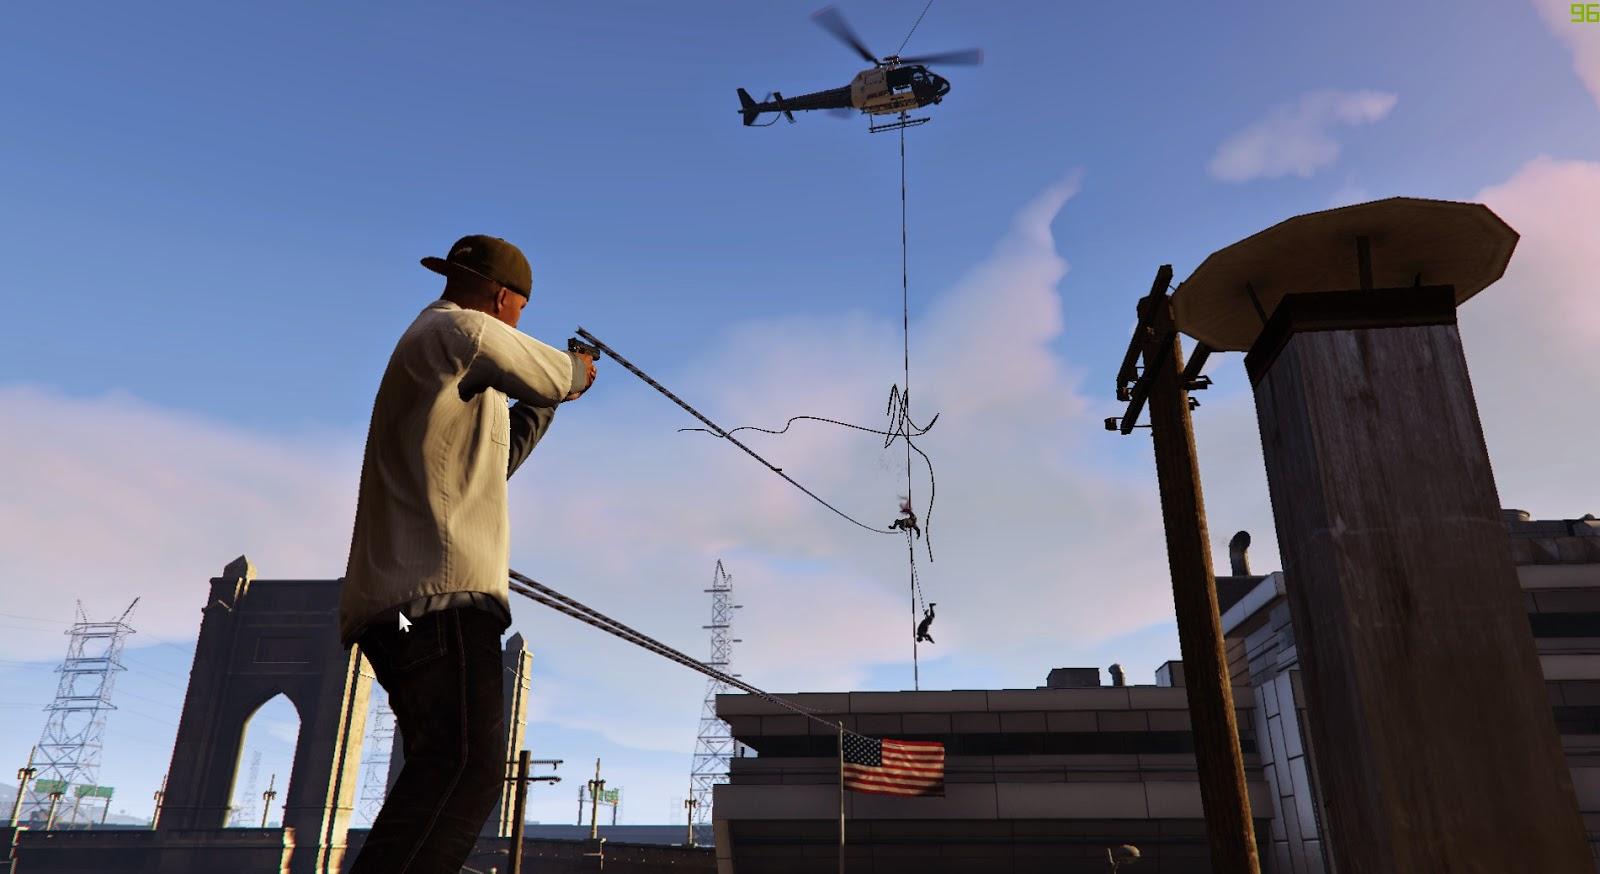 GTA V Mod Brings Just Cause Inspired Grappling Hook